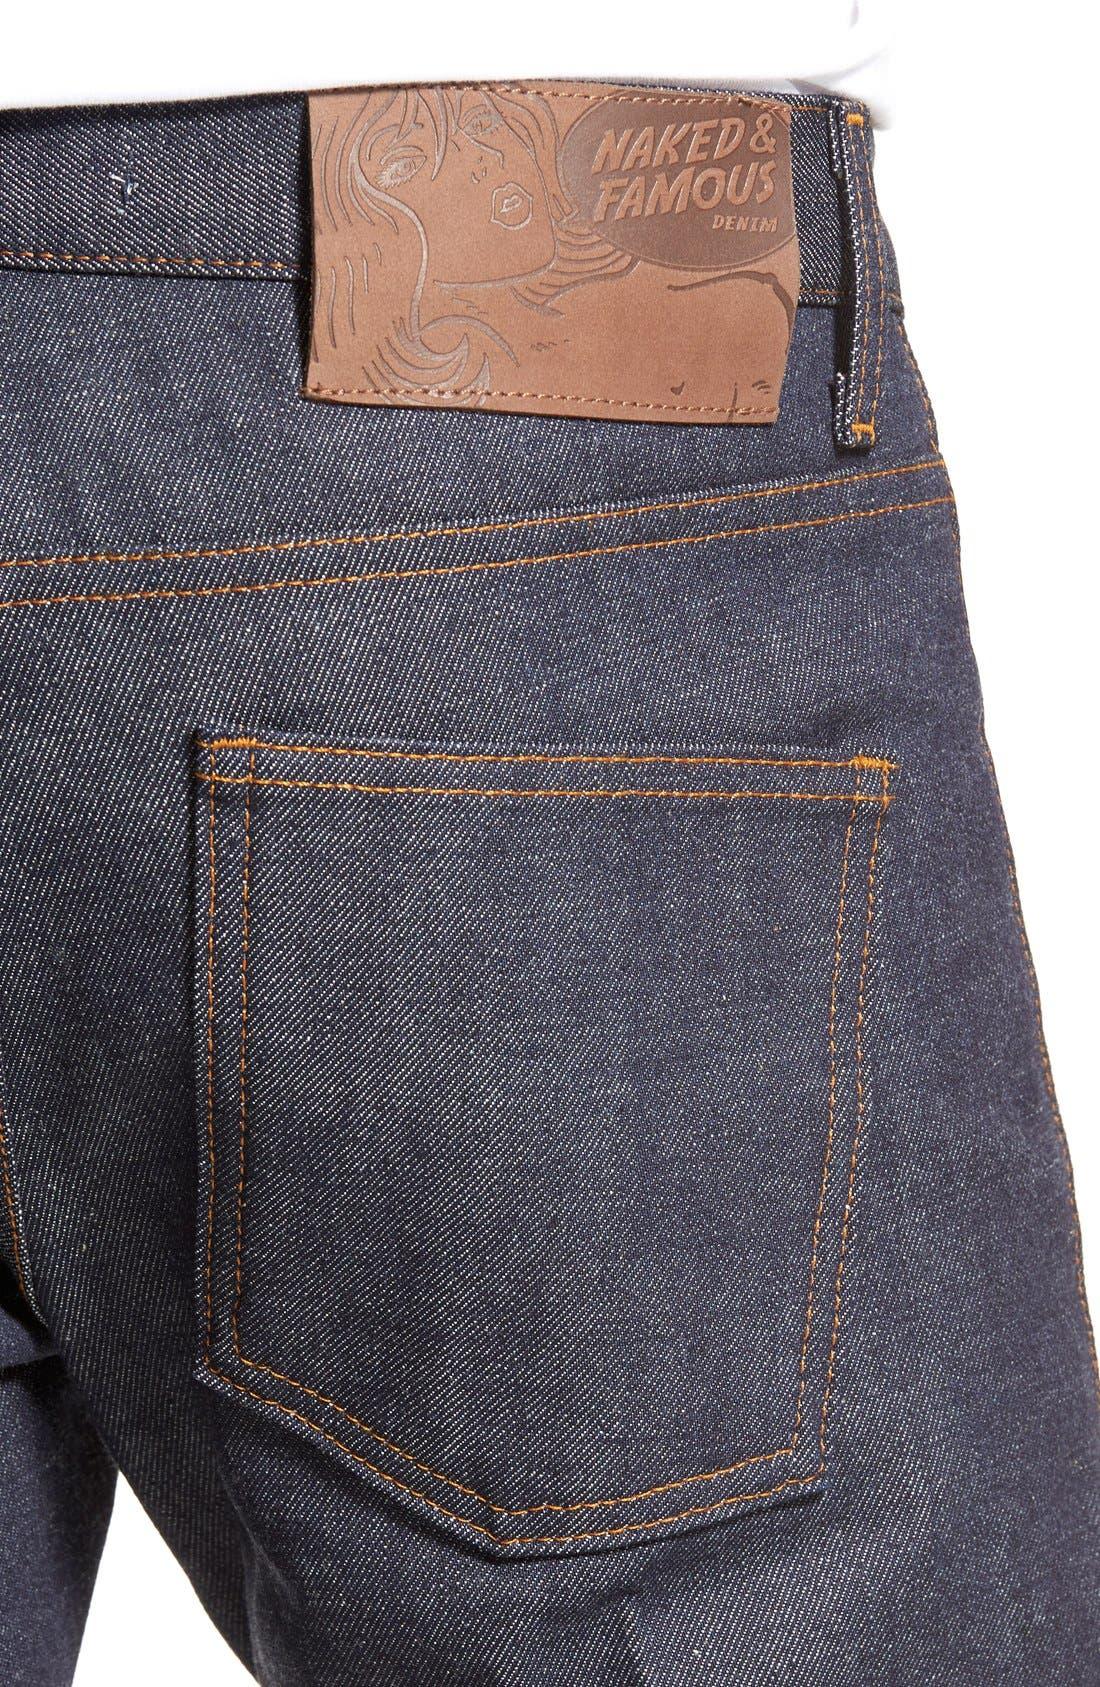 Super Skinny Guy Skinny Fit Selvedge Jeans,                             Alternate thumbnail 4, color,                             INDIGO